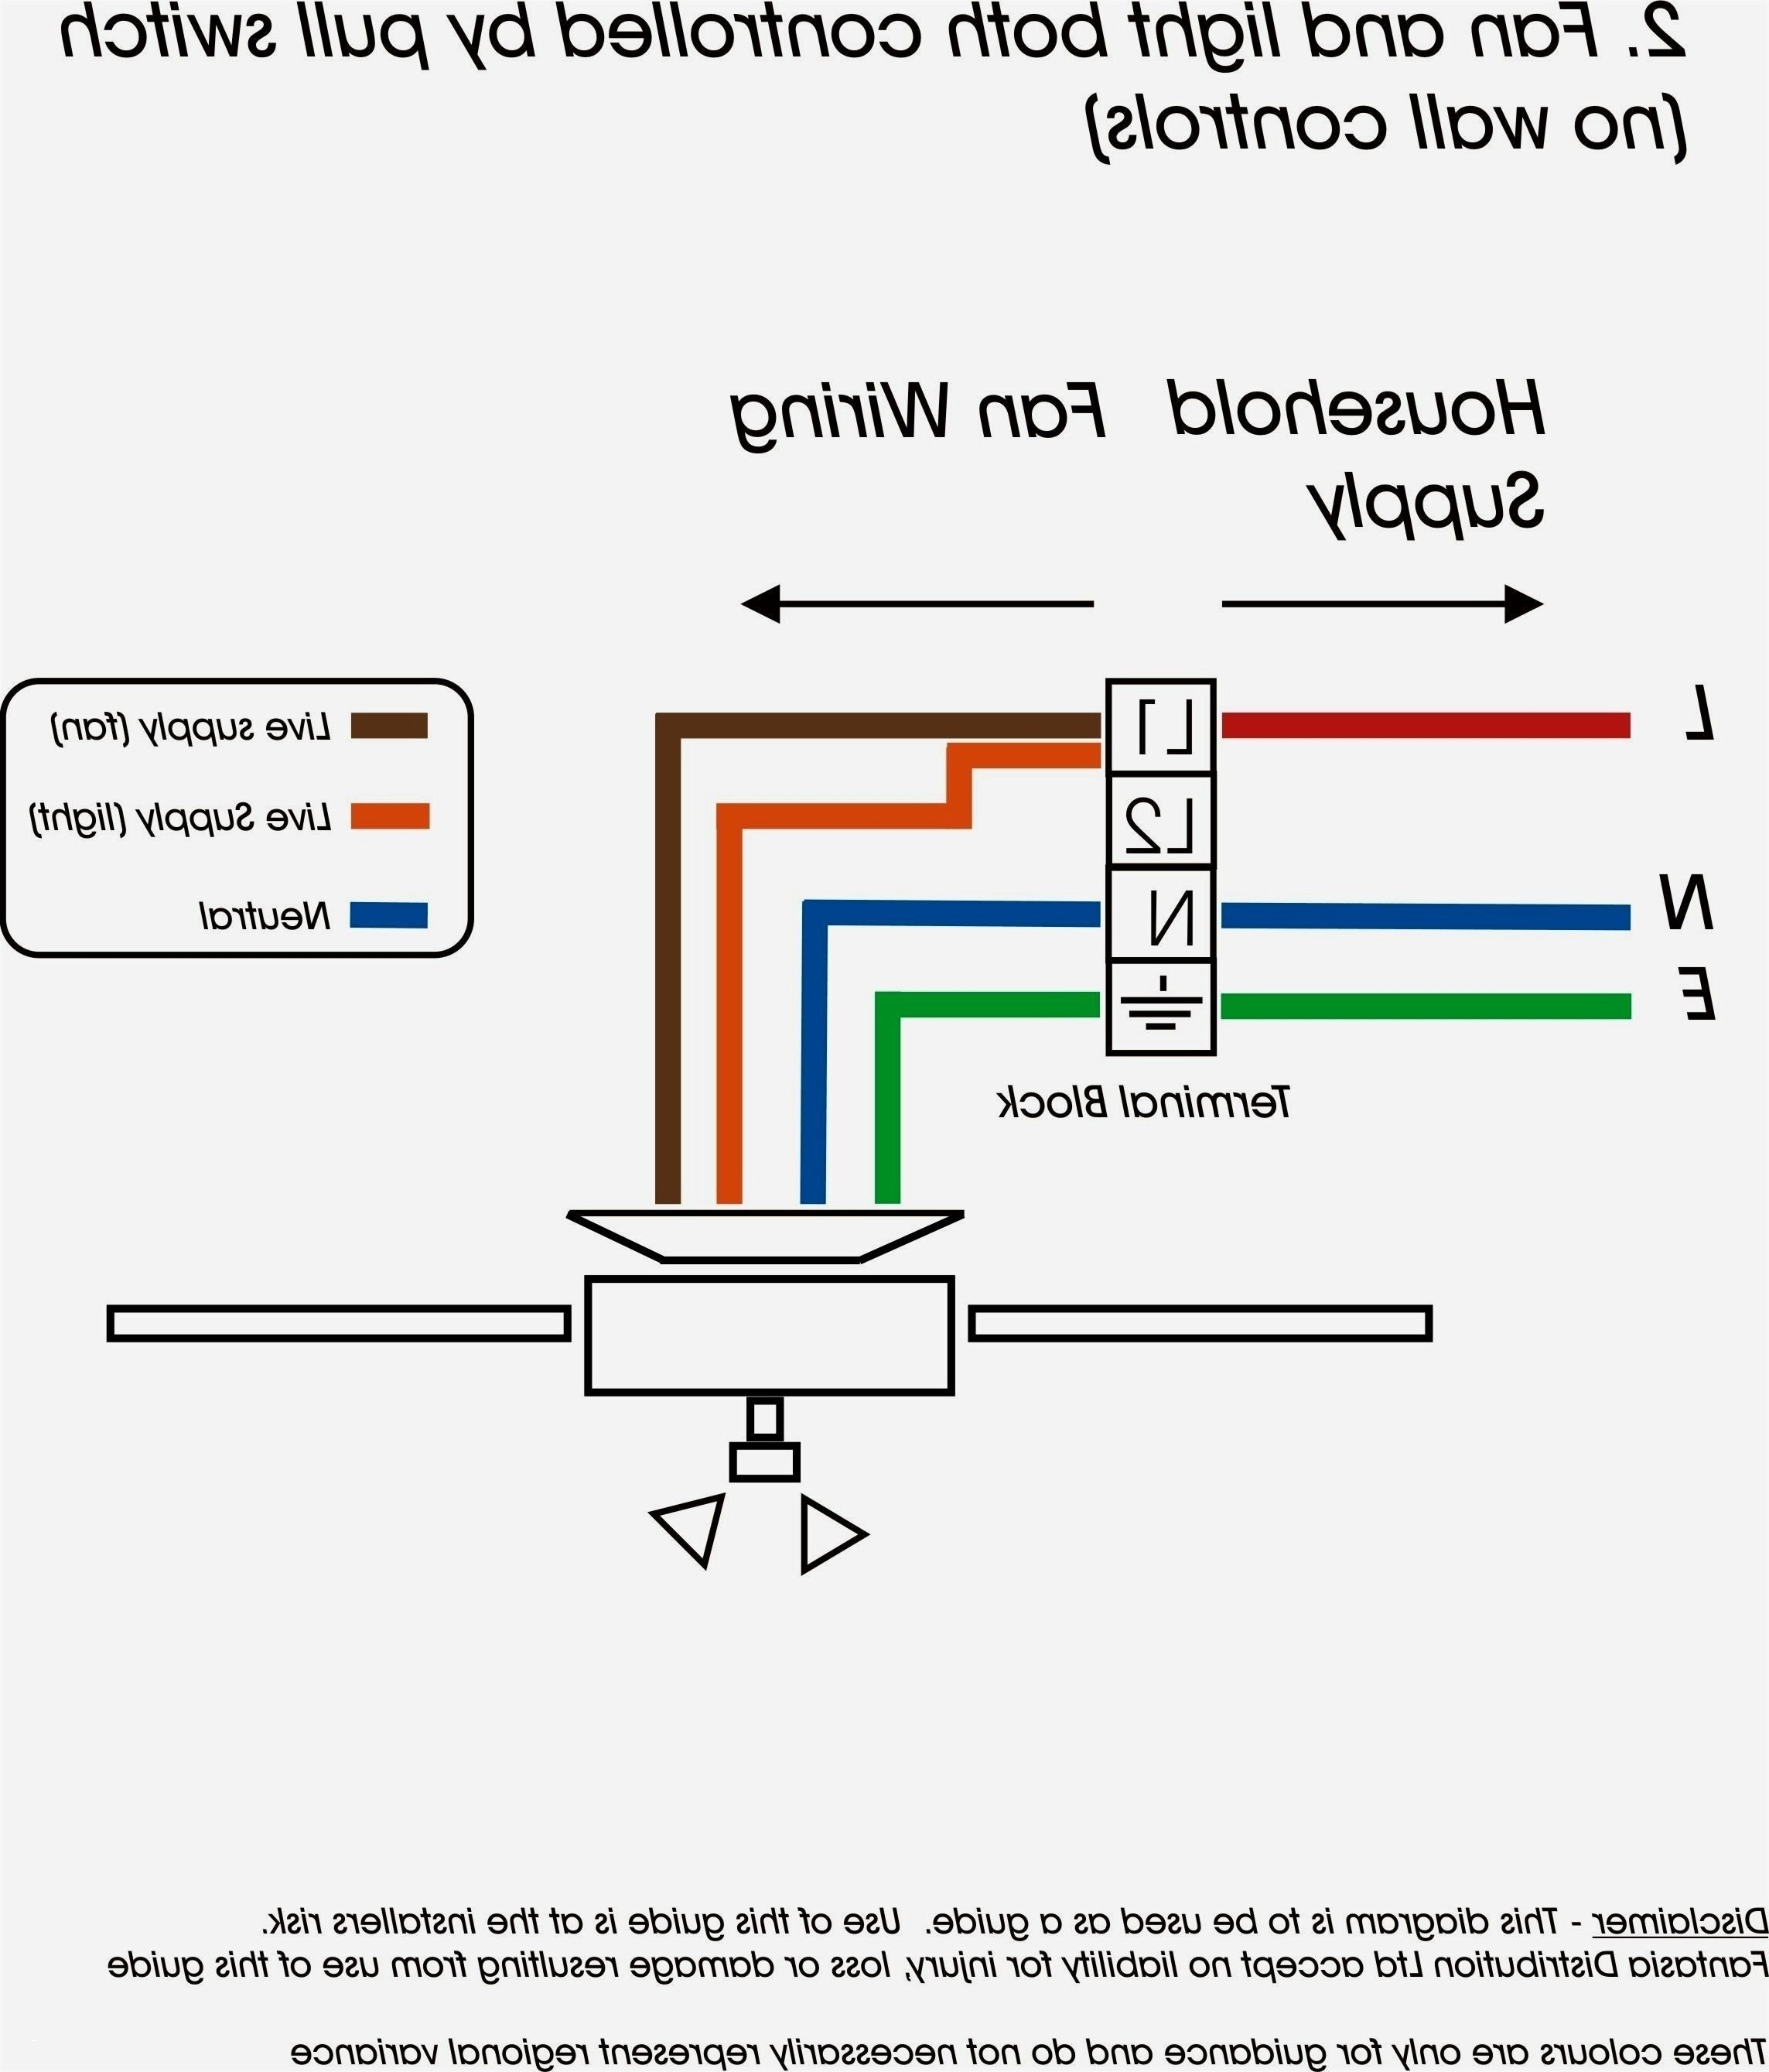 Leviton Decora 3 Way Switch Wiring Diagram 5603 Kf 8881] Leviton Decora 4 Way Switches Diagram Free Diagram Of Leviton Decora 3 Way Switch Wiring Diagram 5603